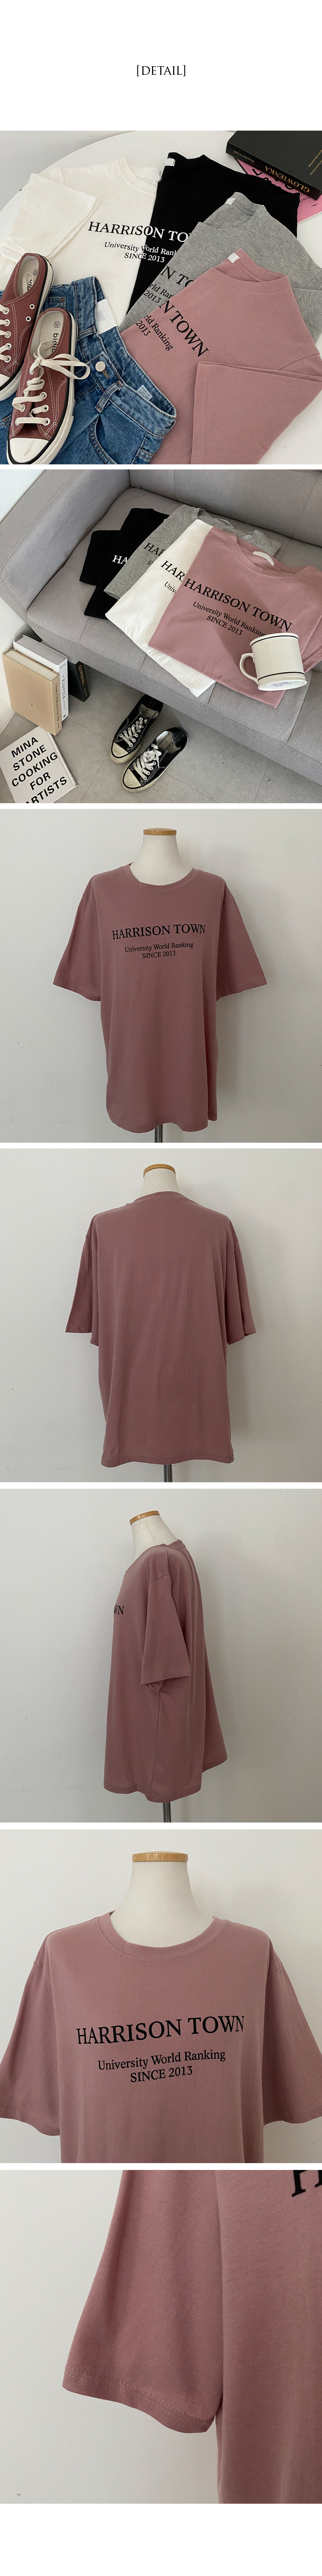 Harrison lettering overfit short-sleeved T-shirt